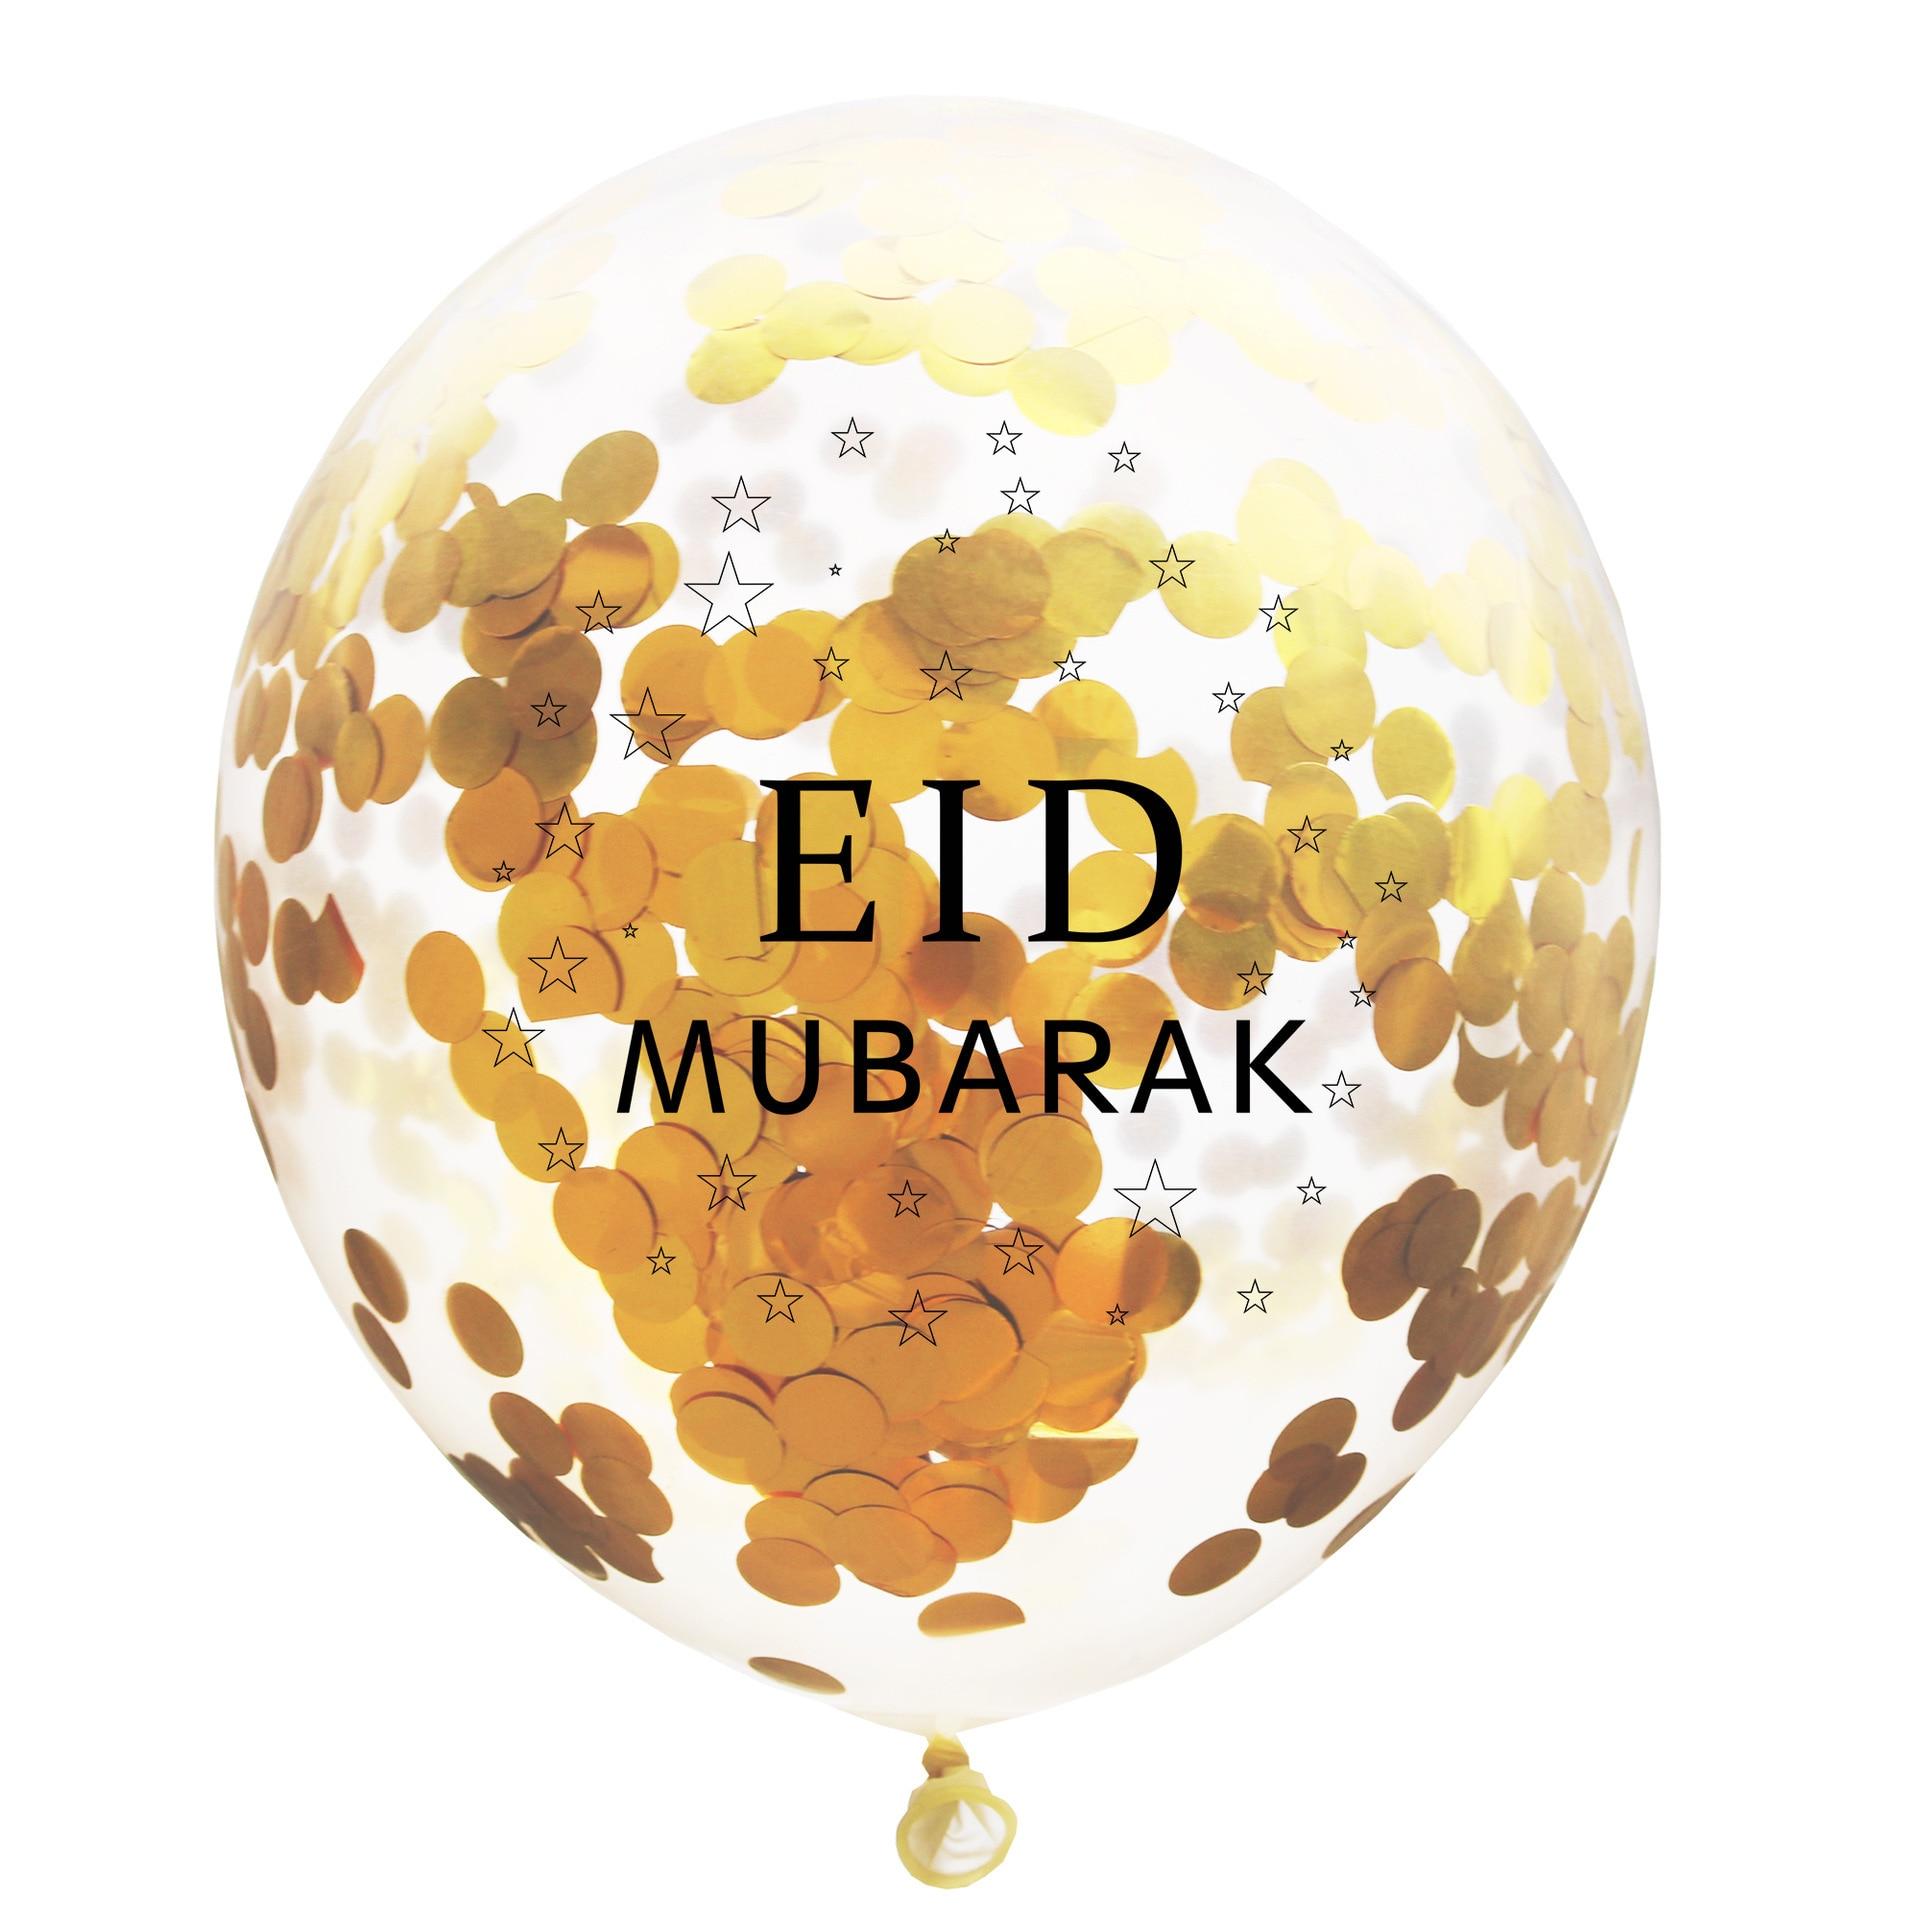 6pcs 12inch Eid Mubarak Decor Confetti Balloon Ramadan Eid wedding Decoration For Home Muslim Ramadan Mubarak Party Supplies